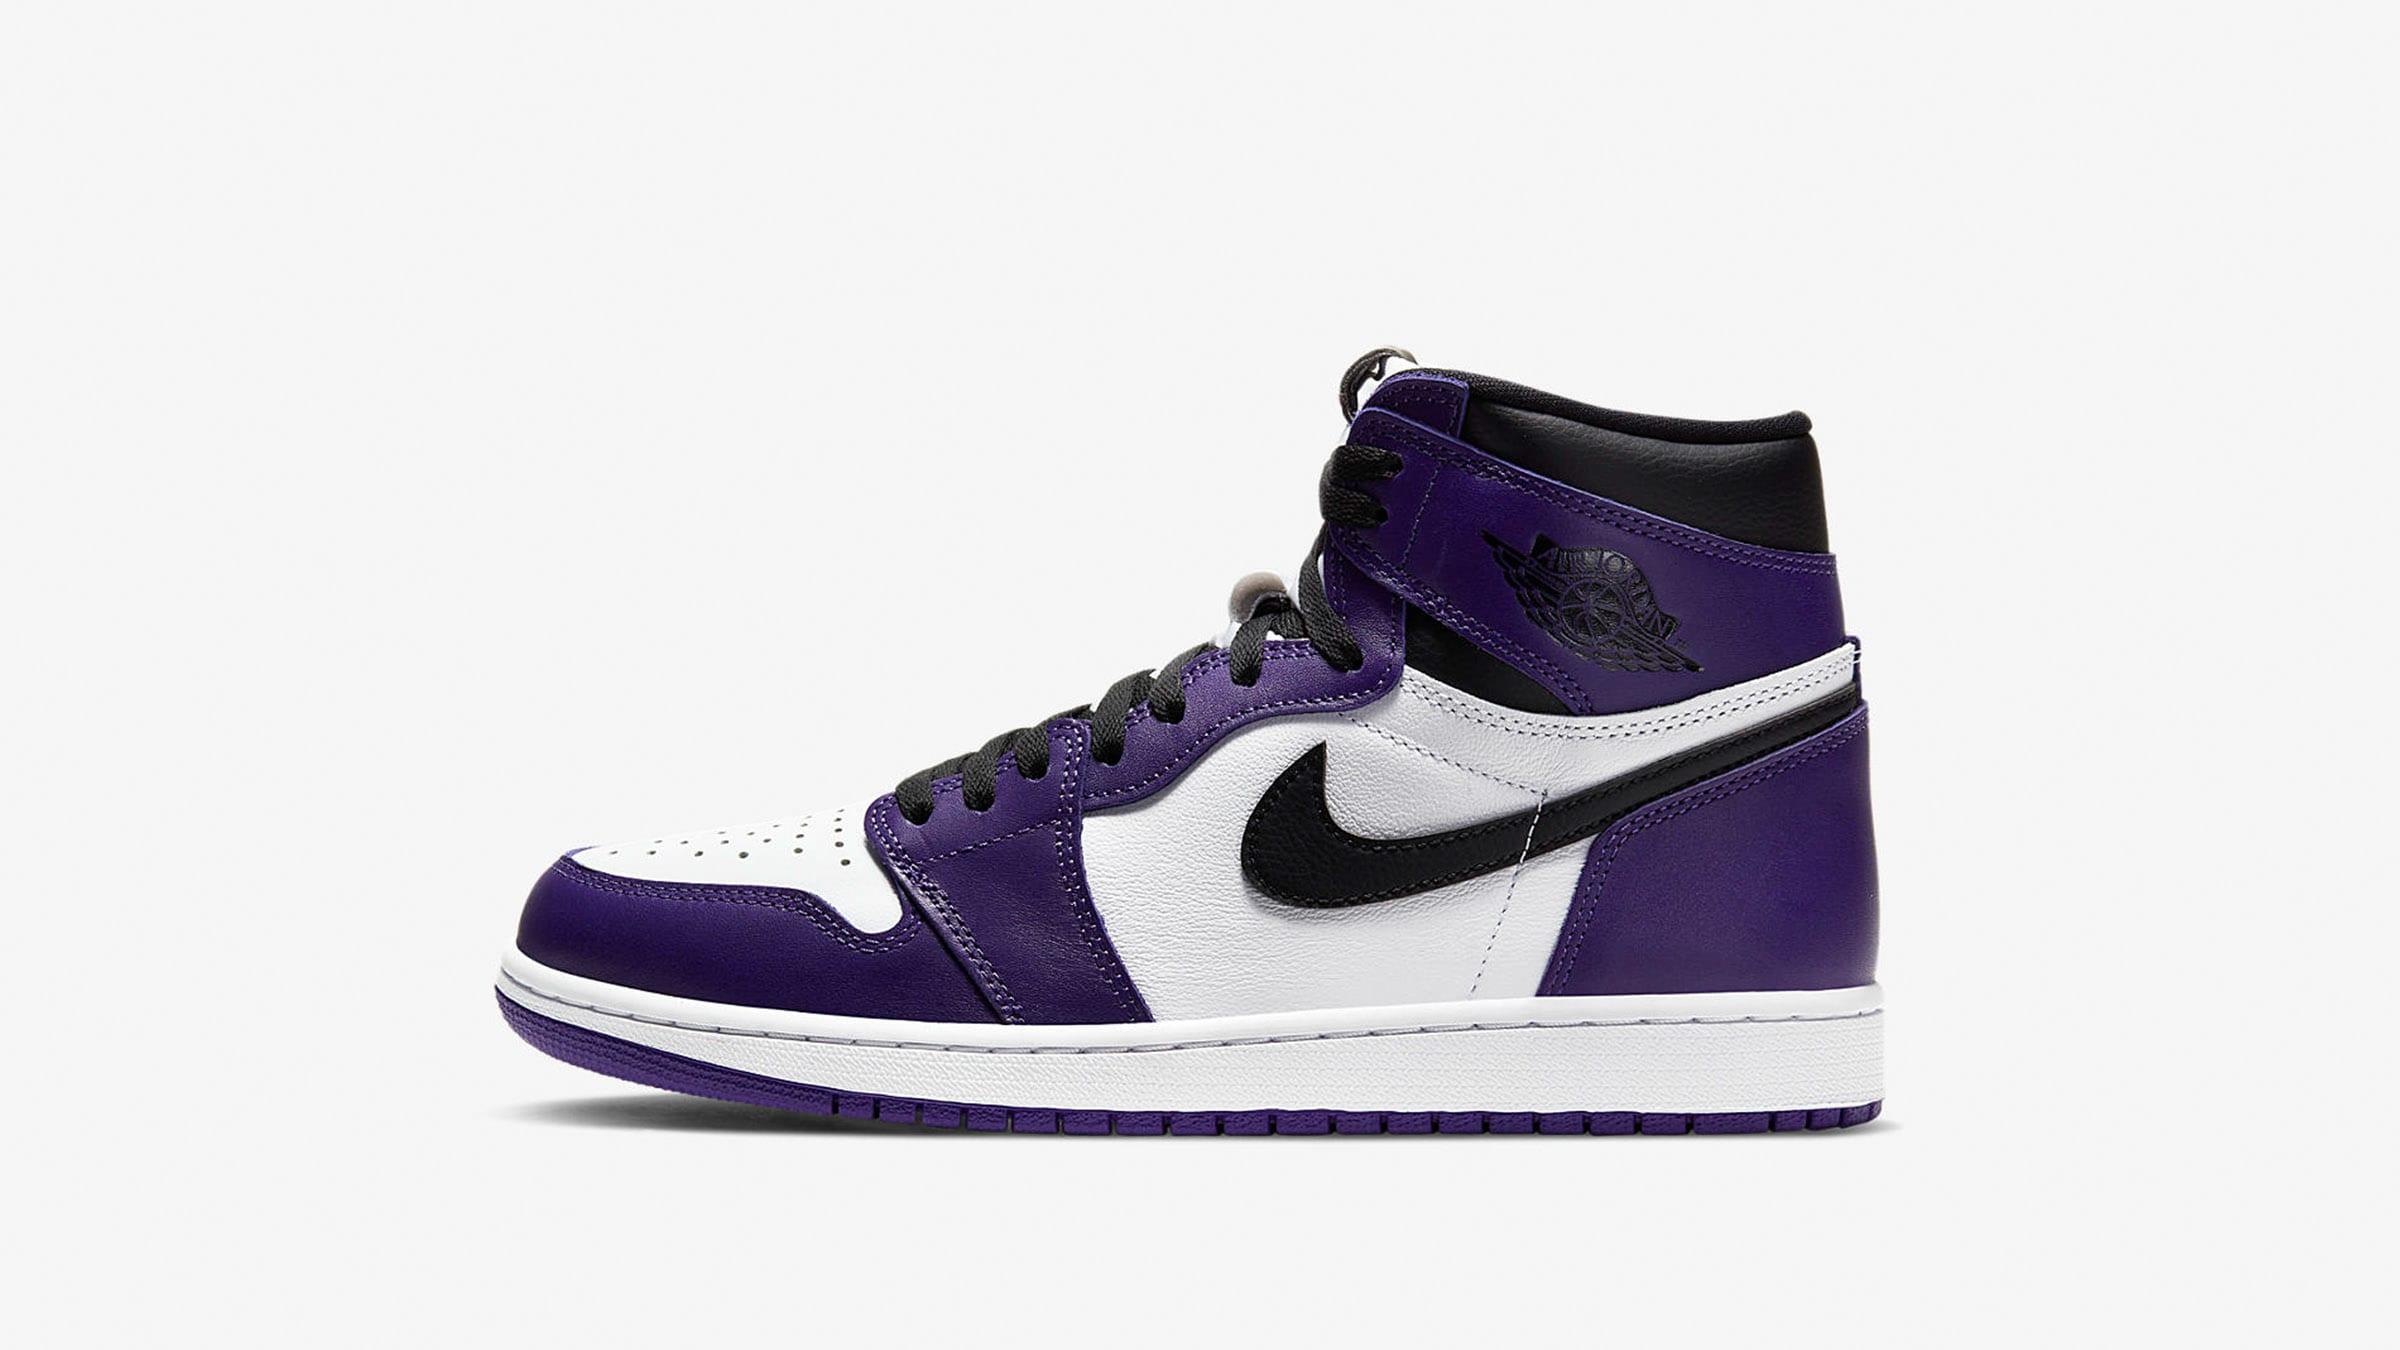 Nike Air Jordan 1 Retro High OG 'Court Purple' - 555088_500